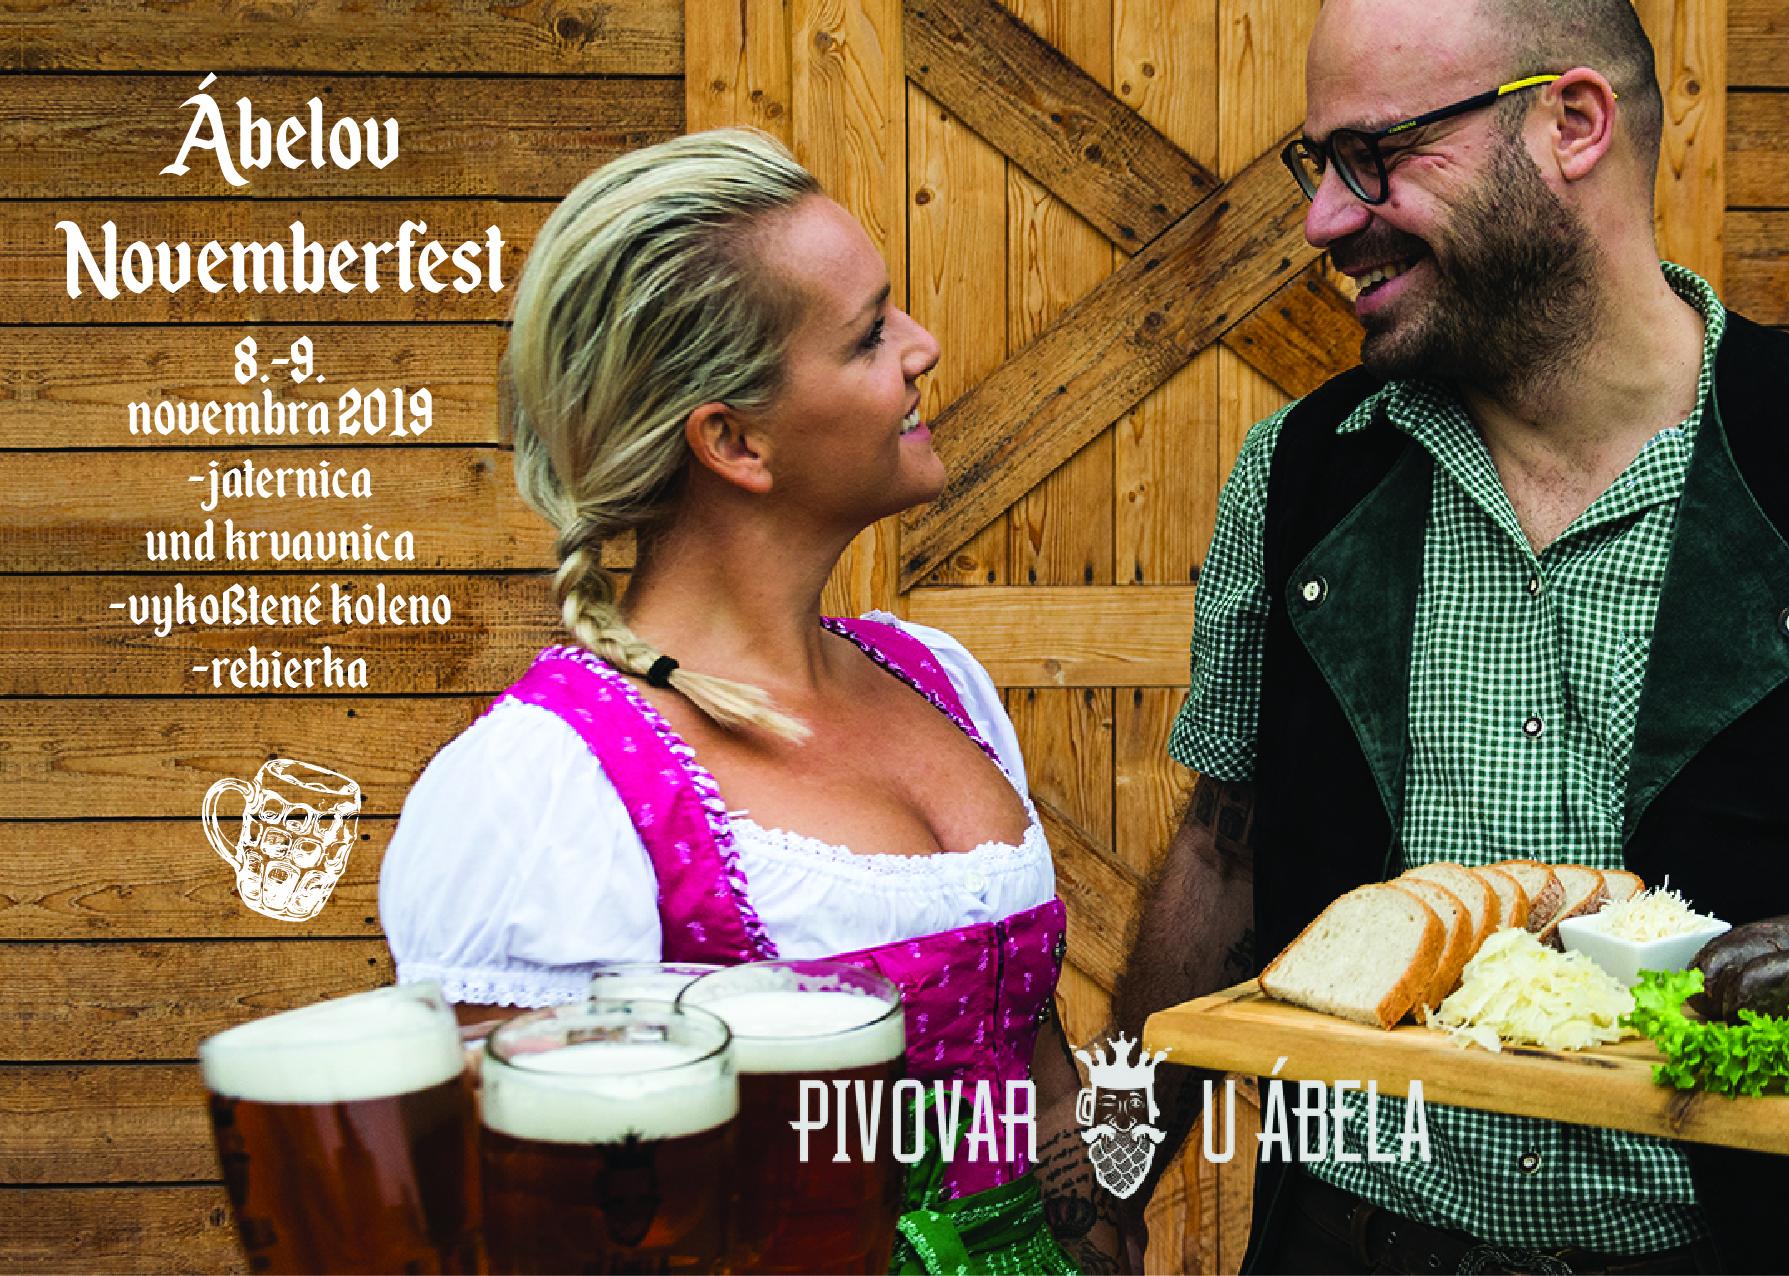 Pivovar U Ábela, Oktoberfest,Novemberfest, kam napivo, craftbeer bratislava